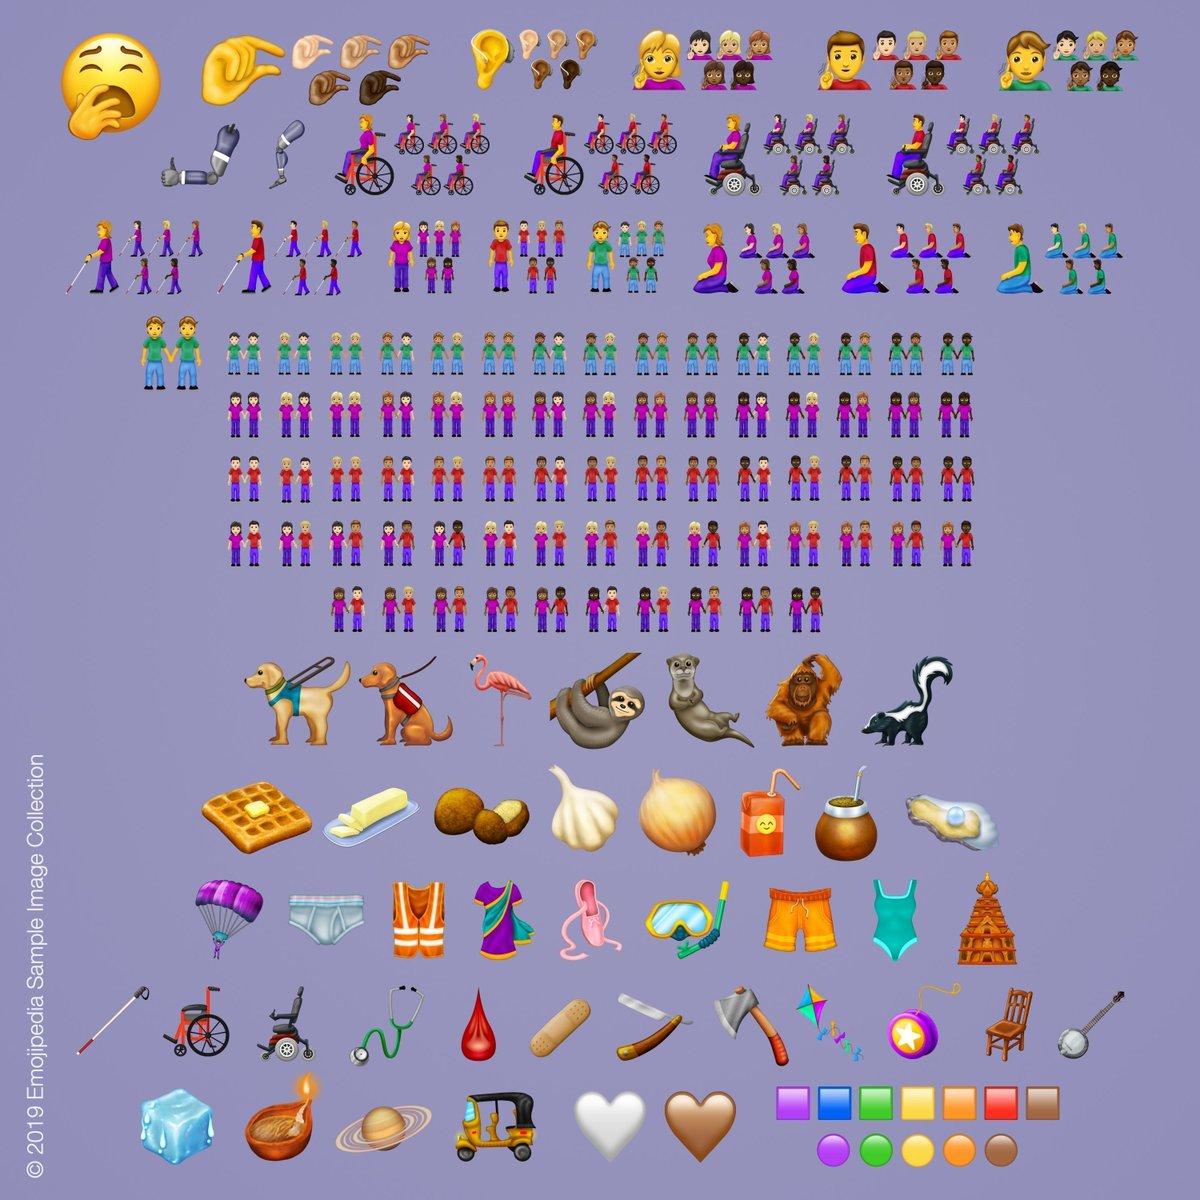 Copy paste emojis twitter